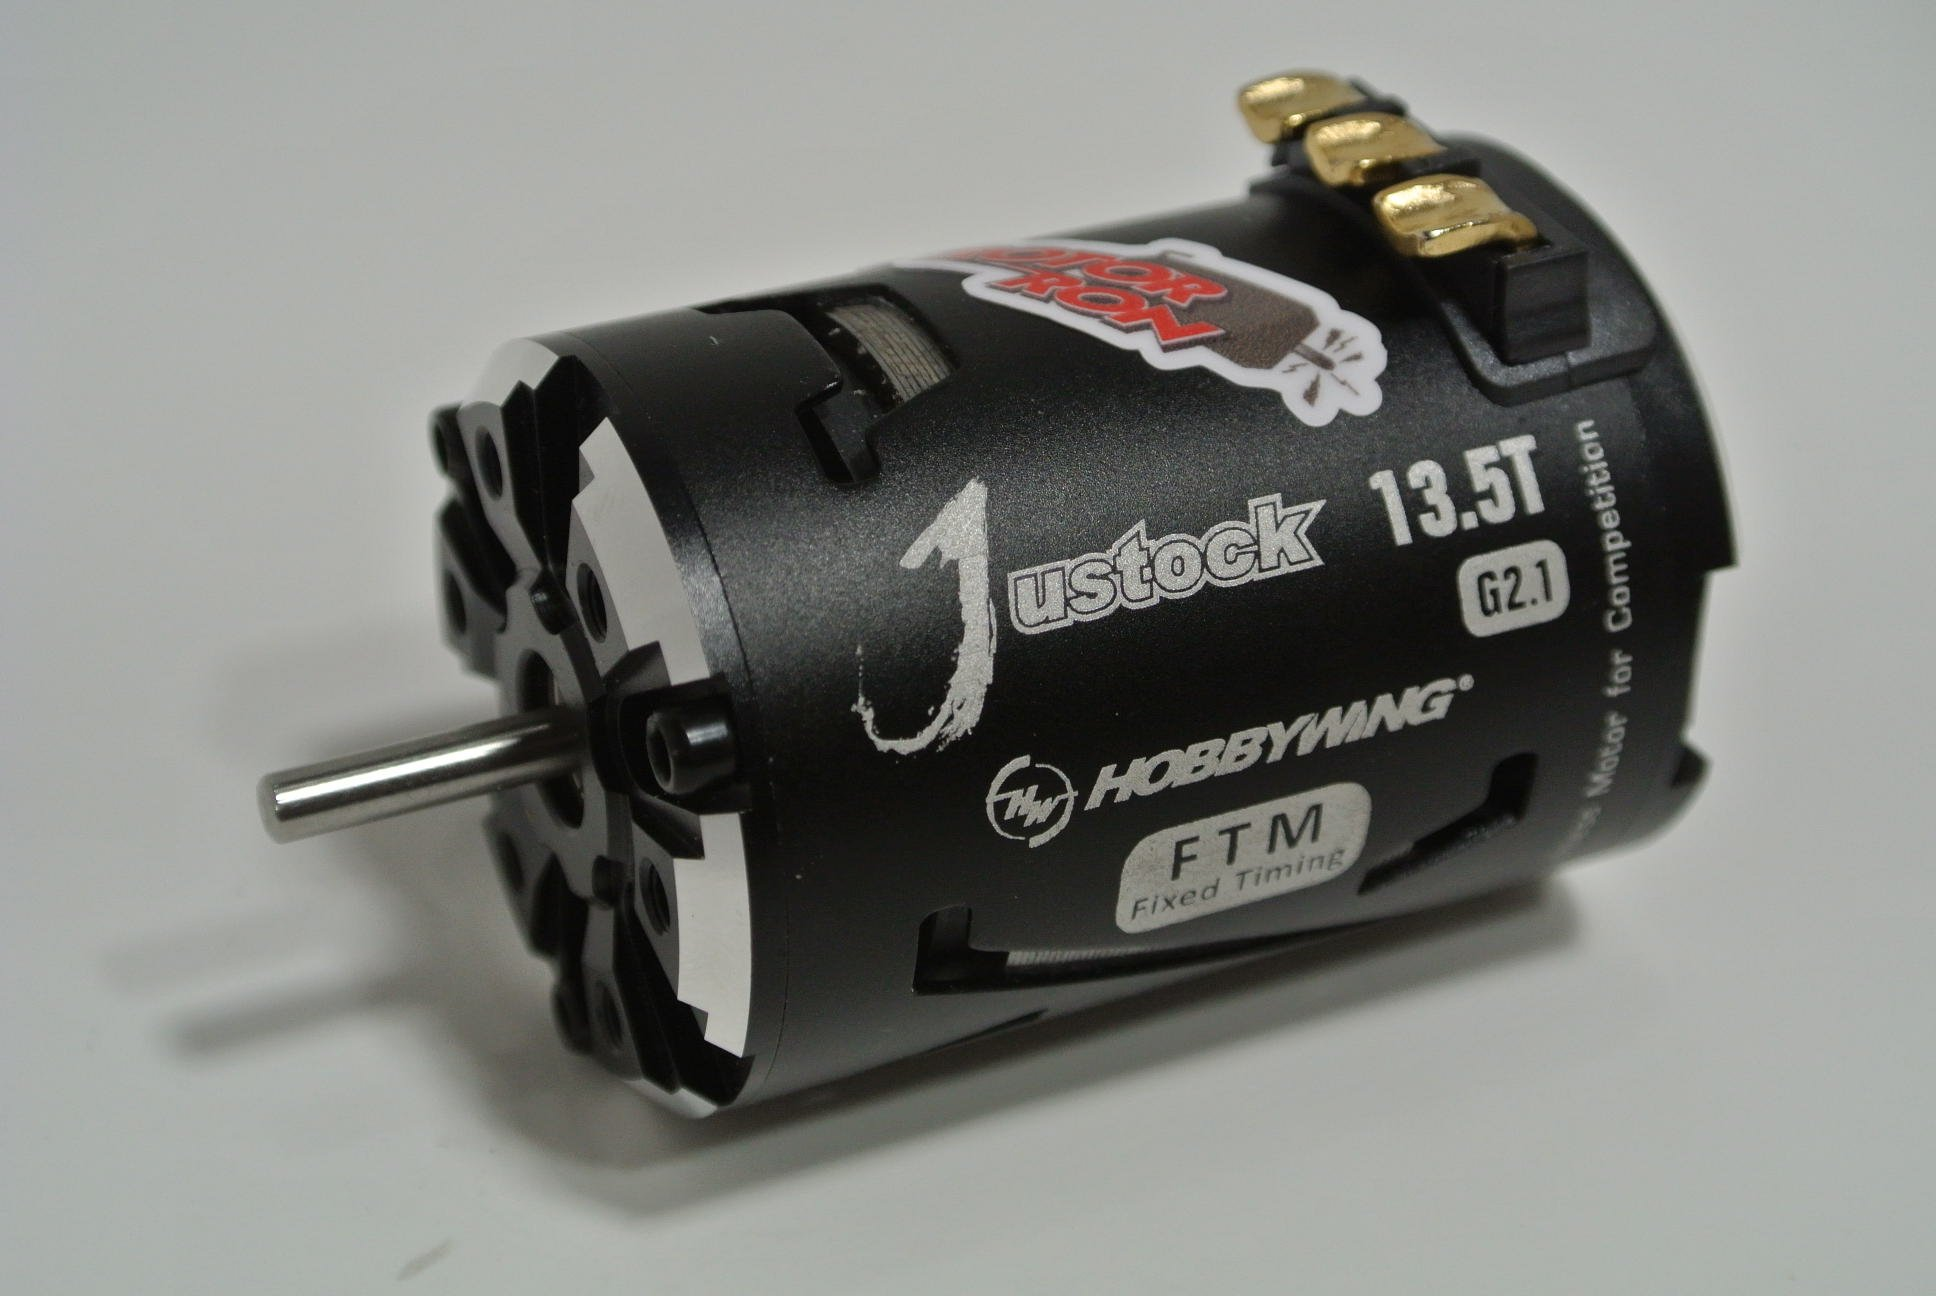 Top 10% Hobbywing Justock 13 5 turn 3650 G2 1 Dyno Tested Brushless Motor